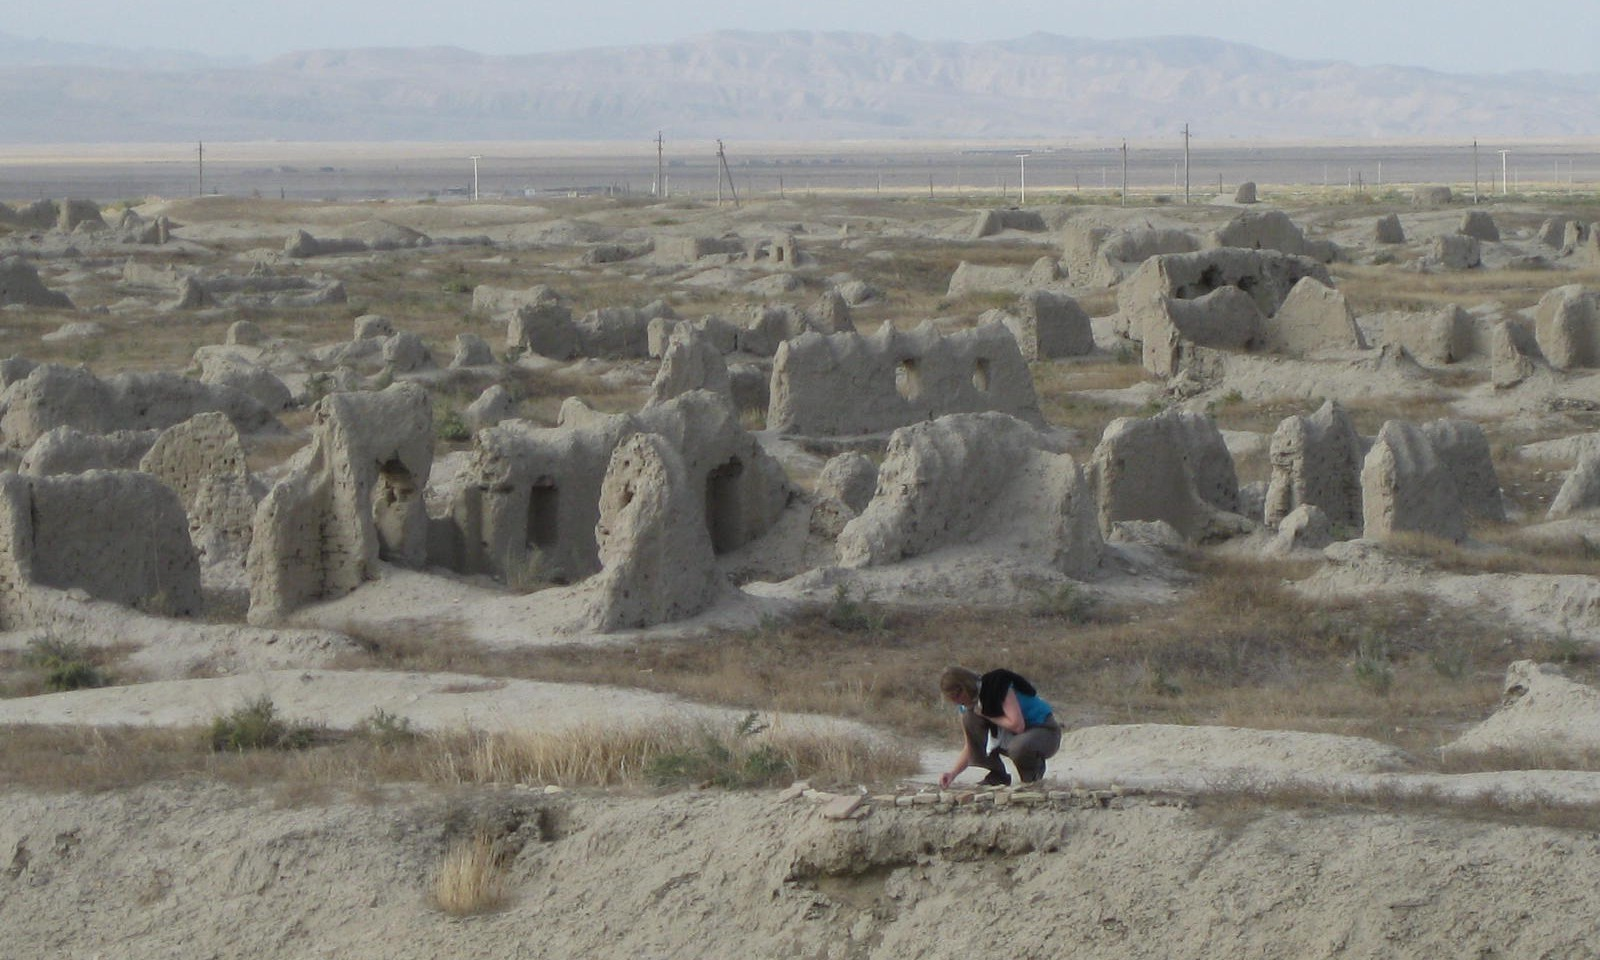 turkmenistan-IMG_4691-e1448612718635